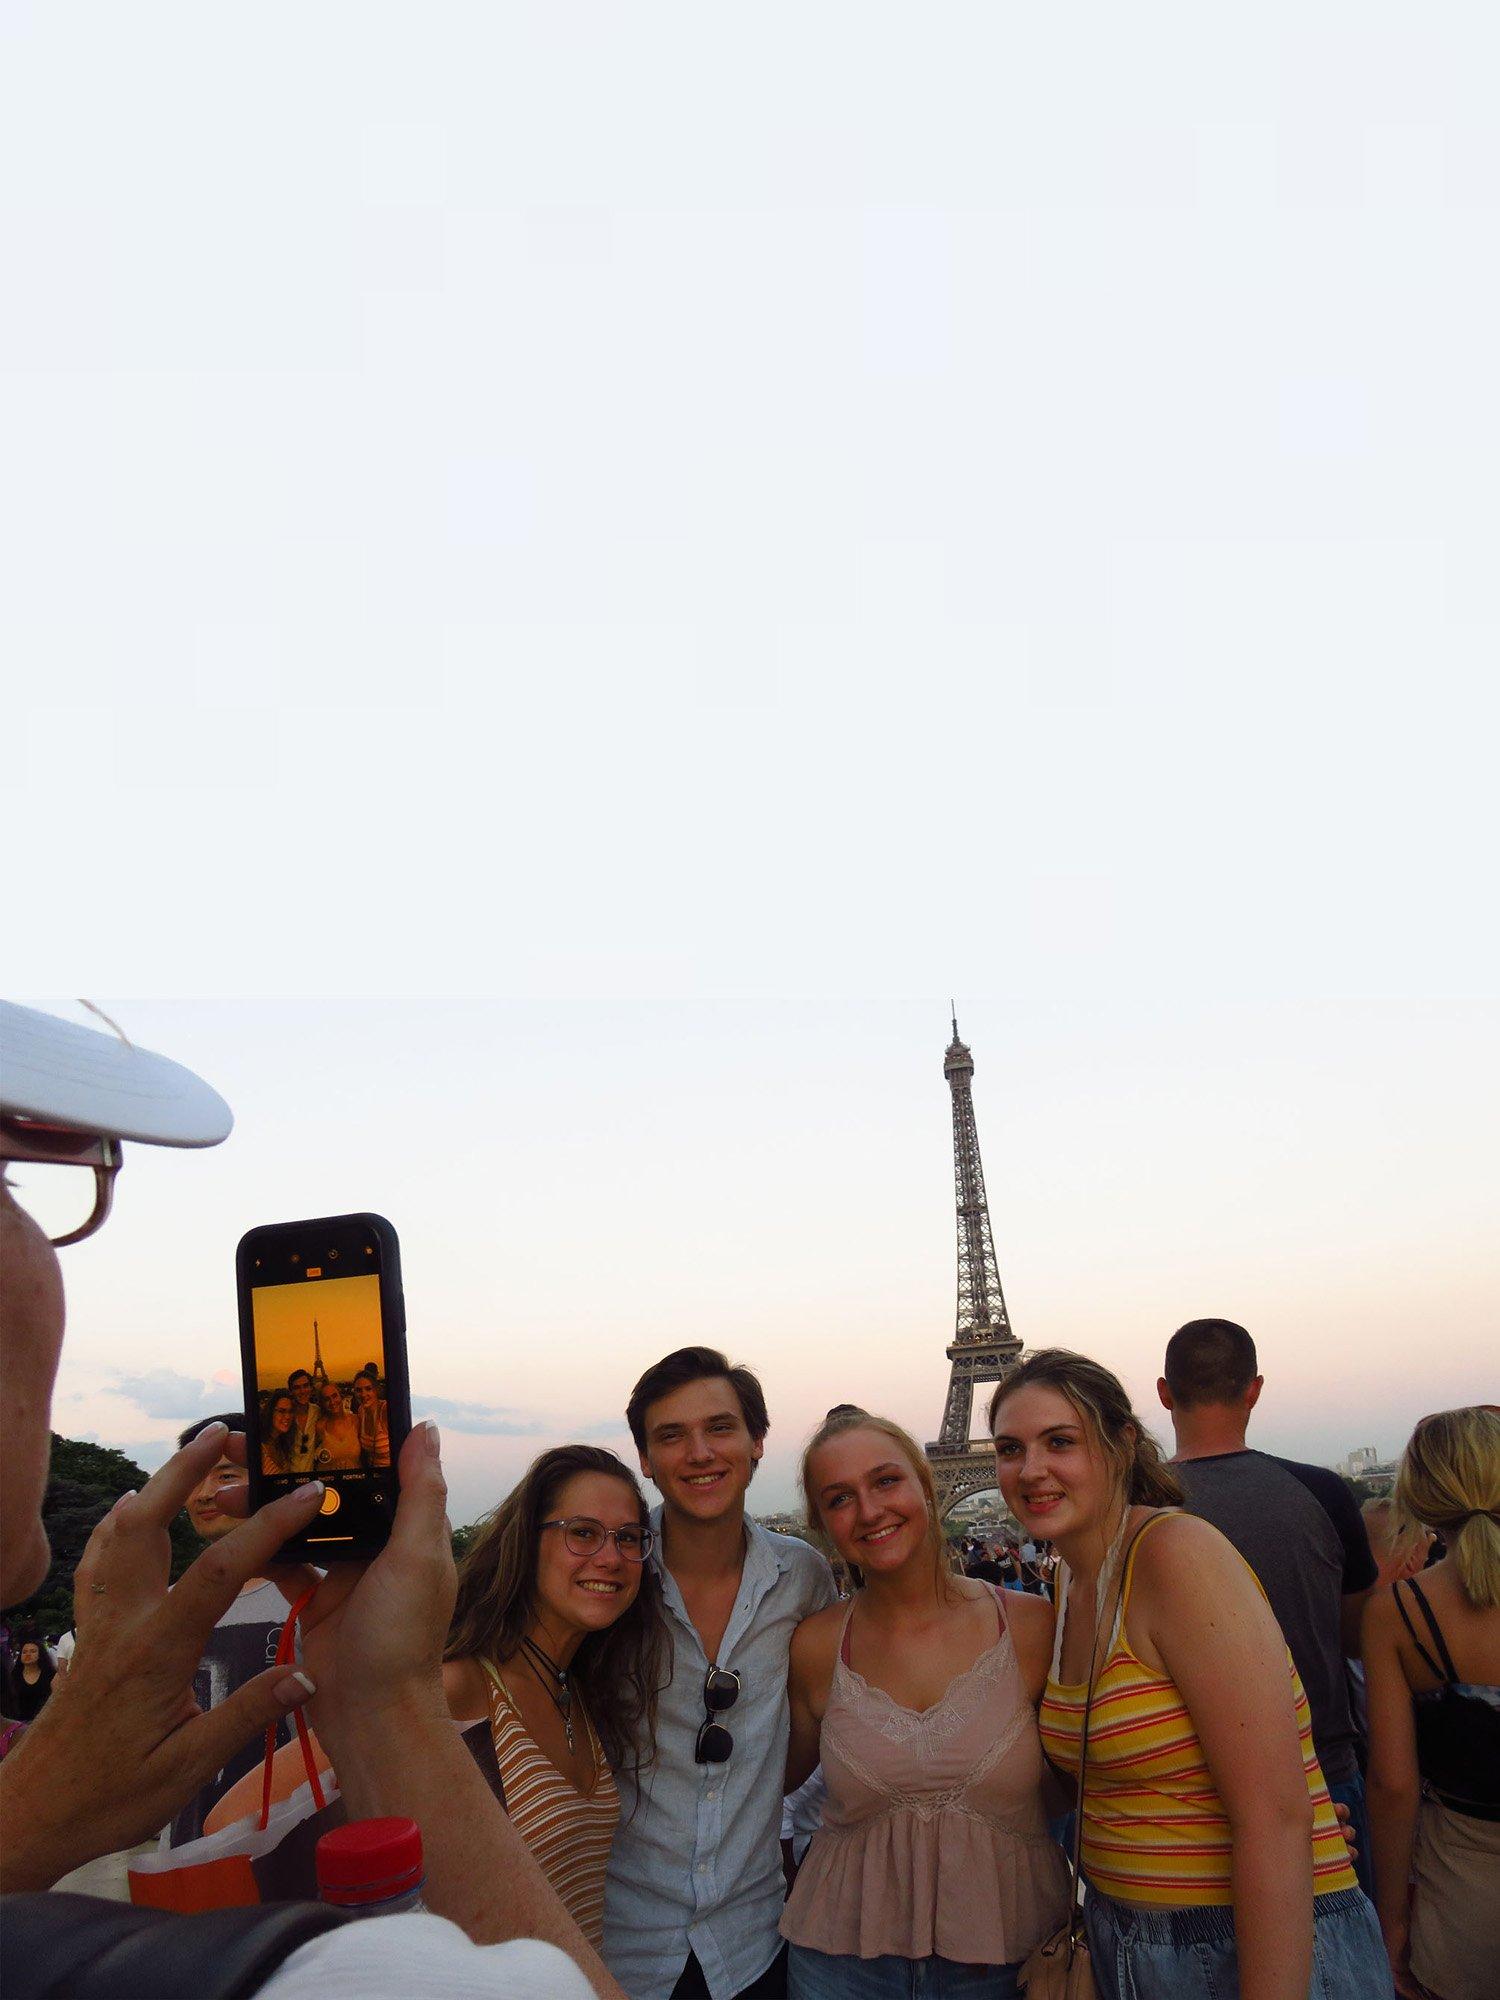 Jumpstreet-Educational-Tours-Class-Trip-Paris-France